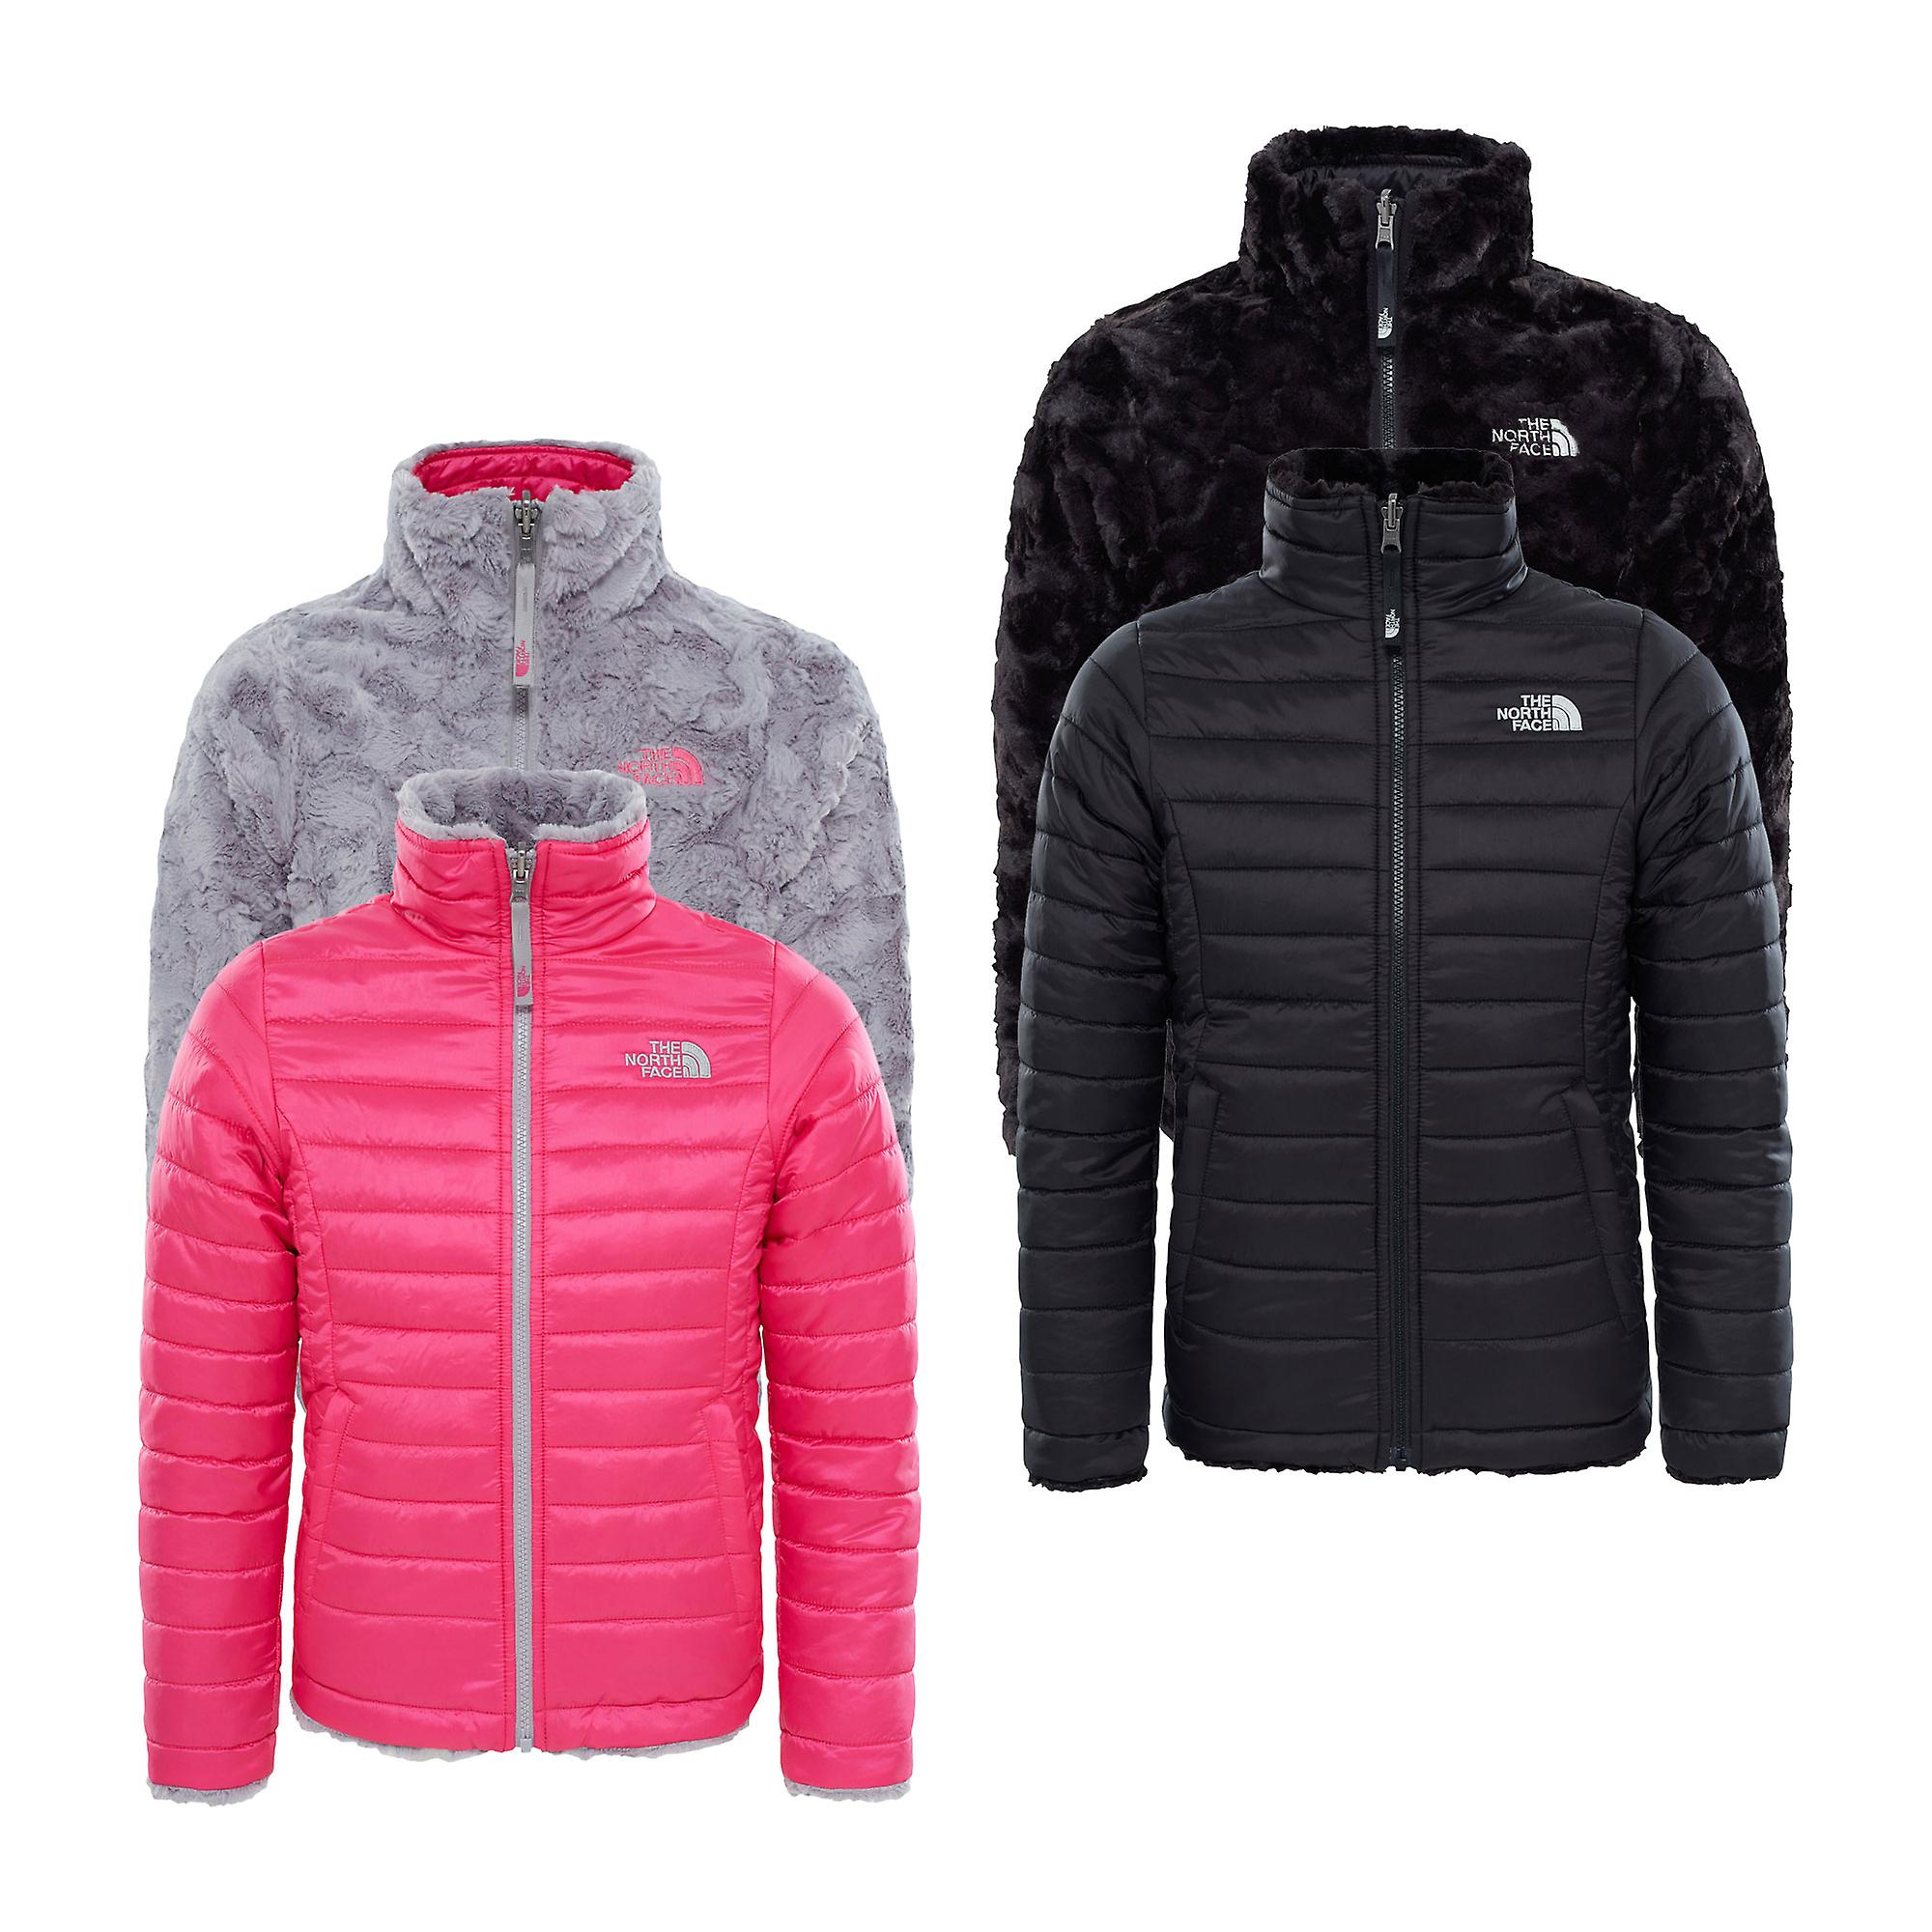 2082c7ef900b The North Face Girls Reversible Mossbud Swirl Jacket